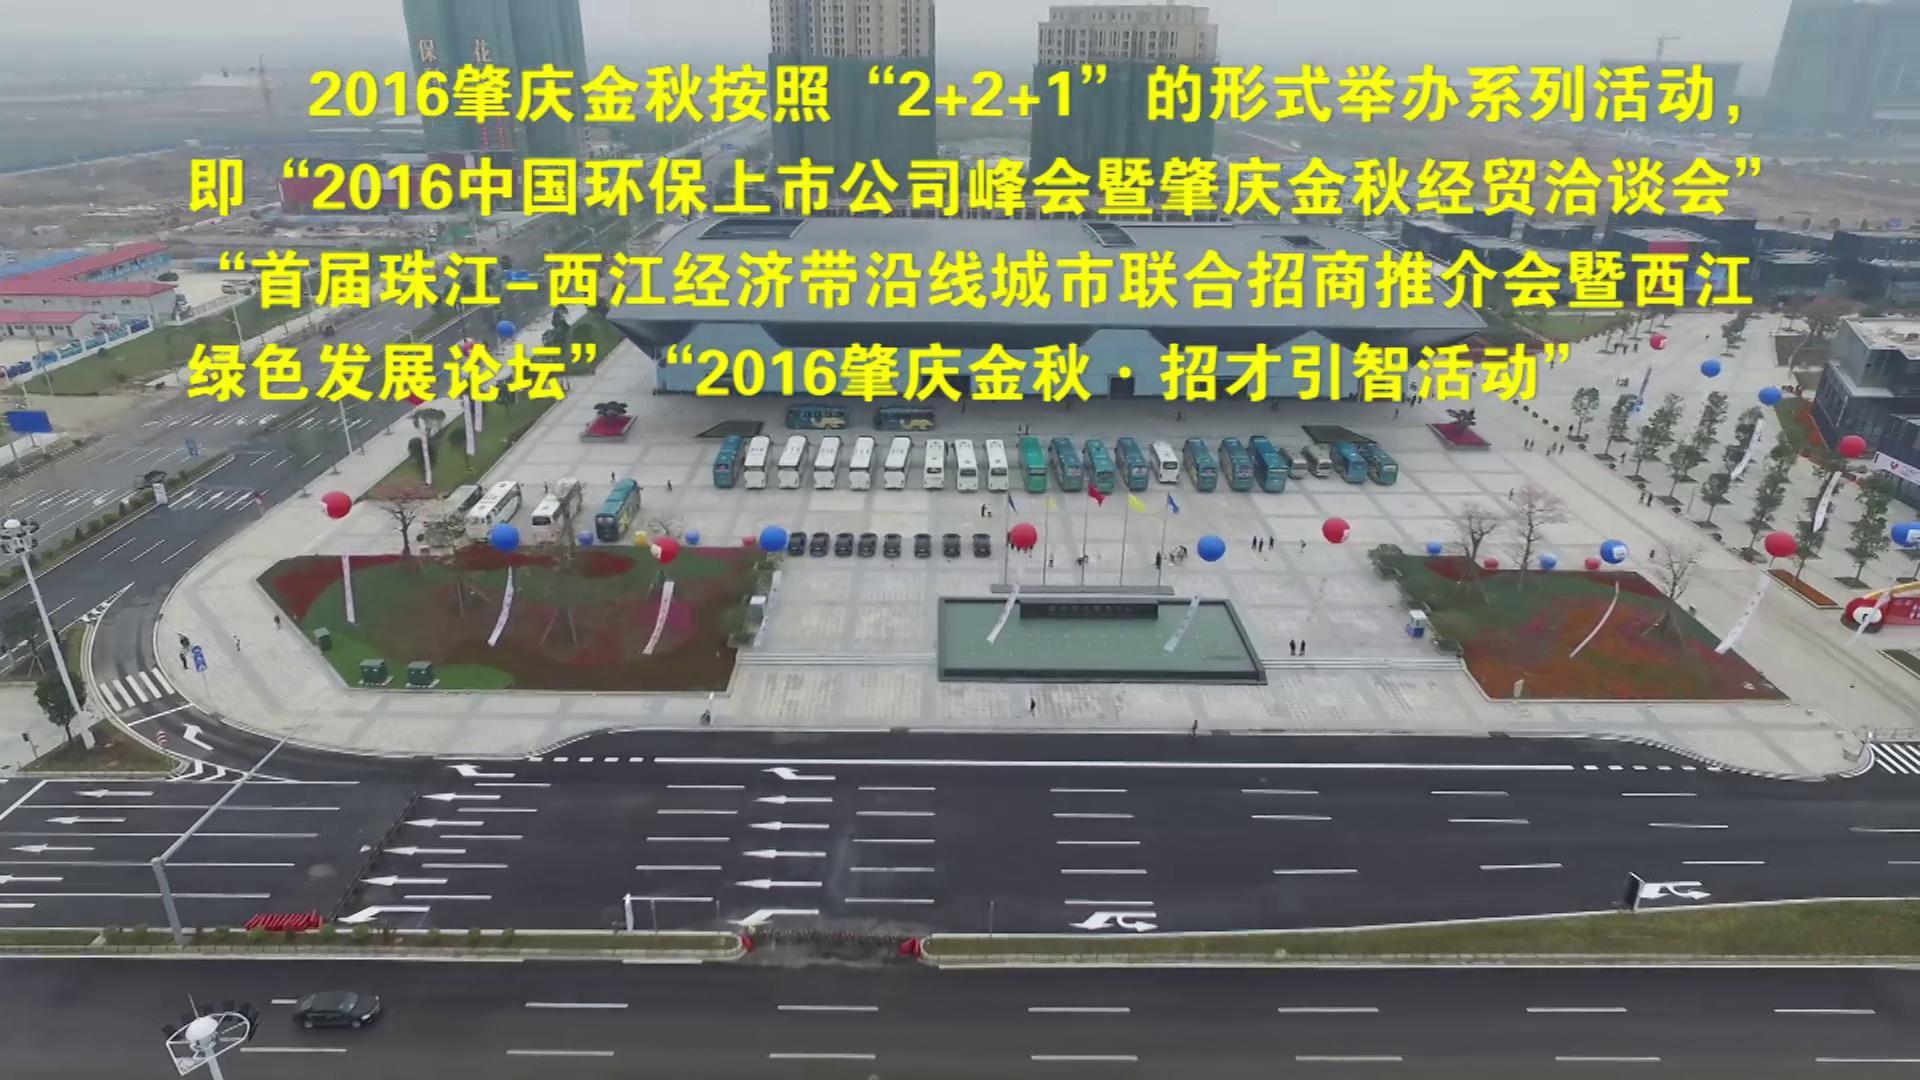 2016APP自助领取彩金38金秋视频回顾